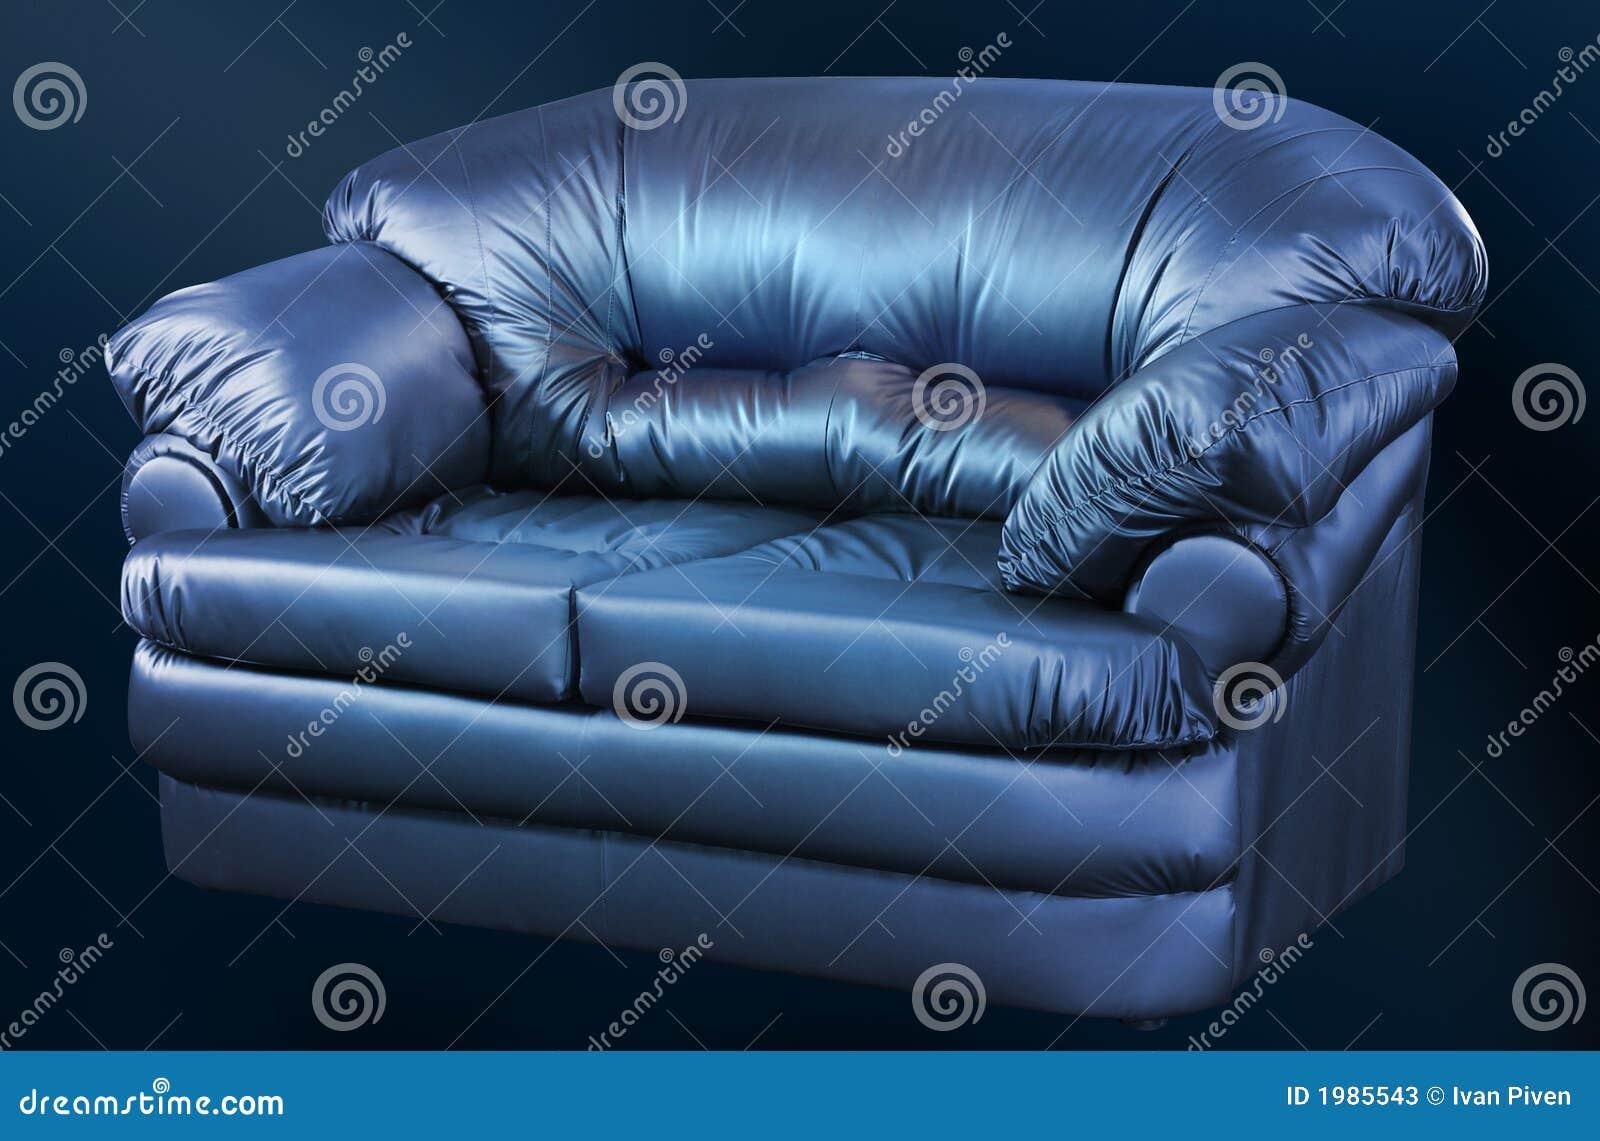 Fashionable Leather Sofa On A Black Background Stock Image